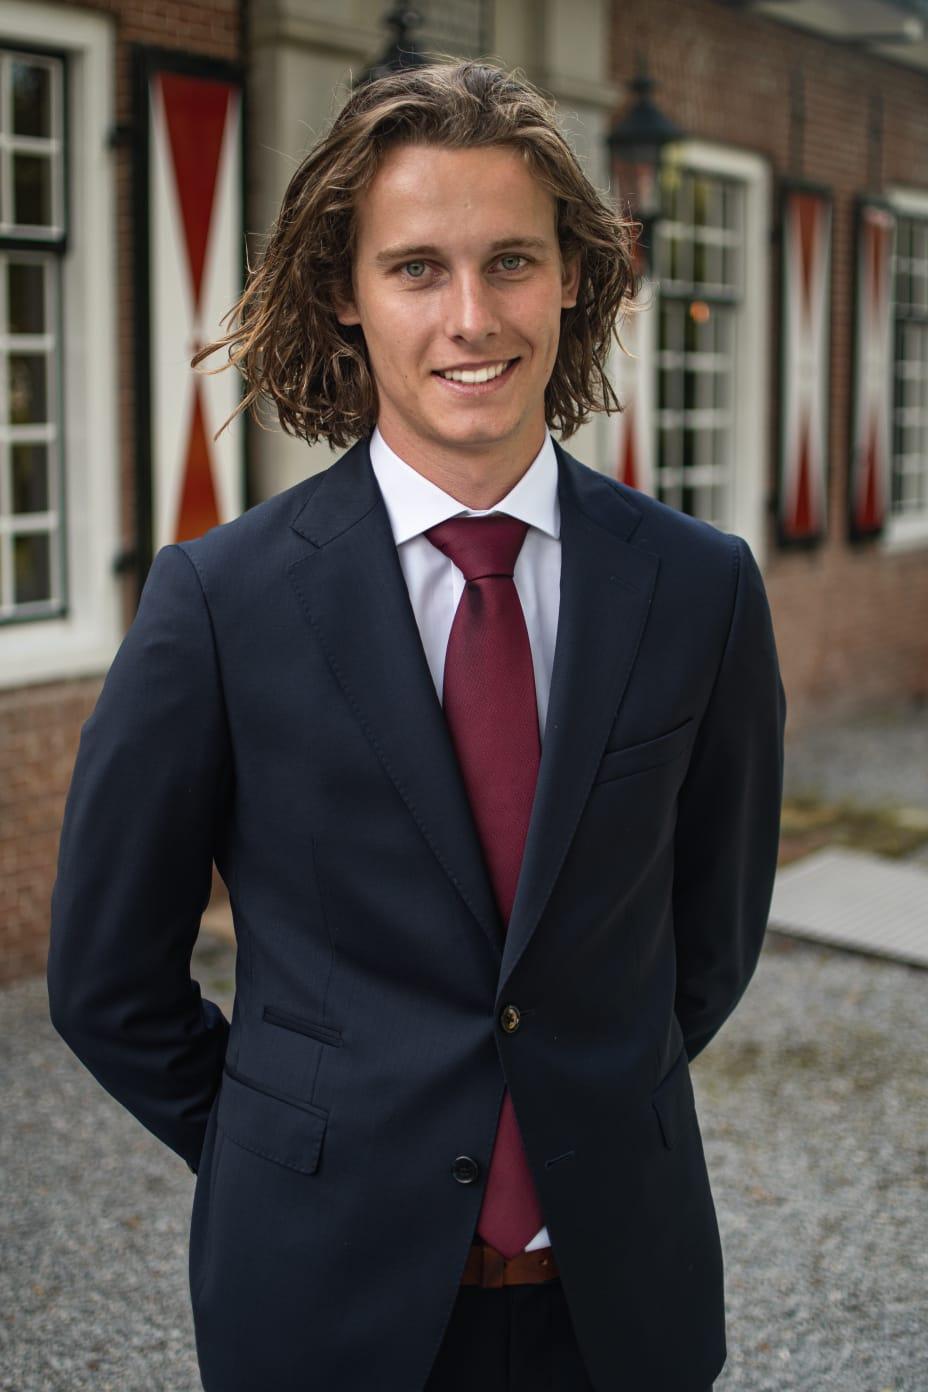 Thijs_Boersma.JPG